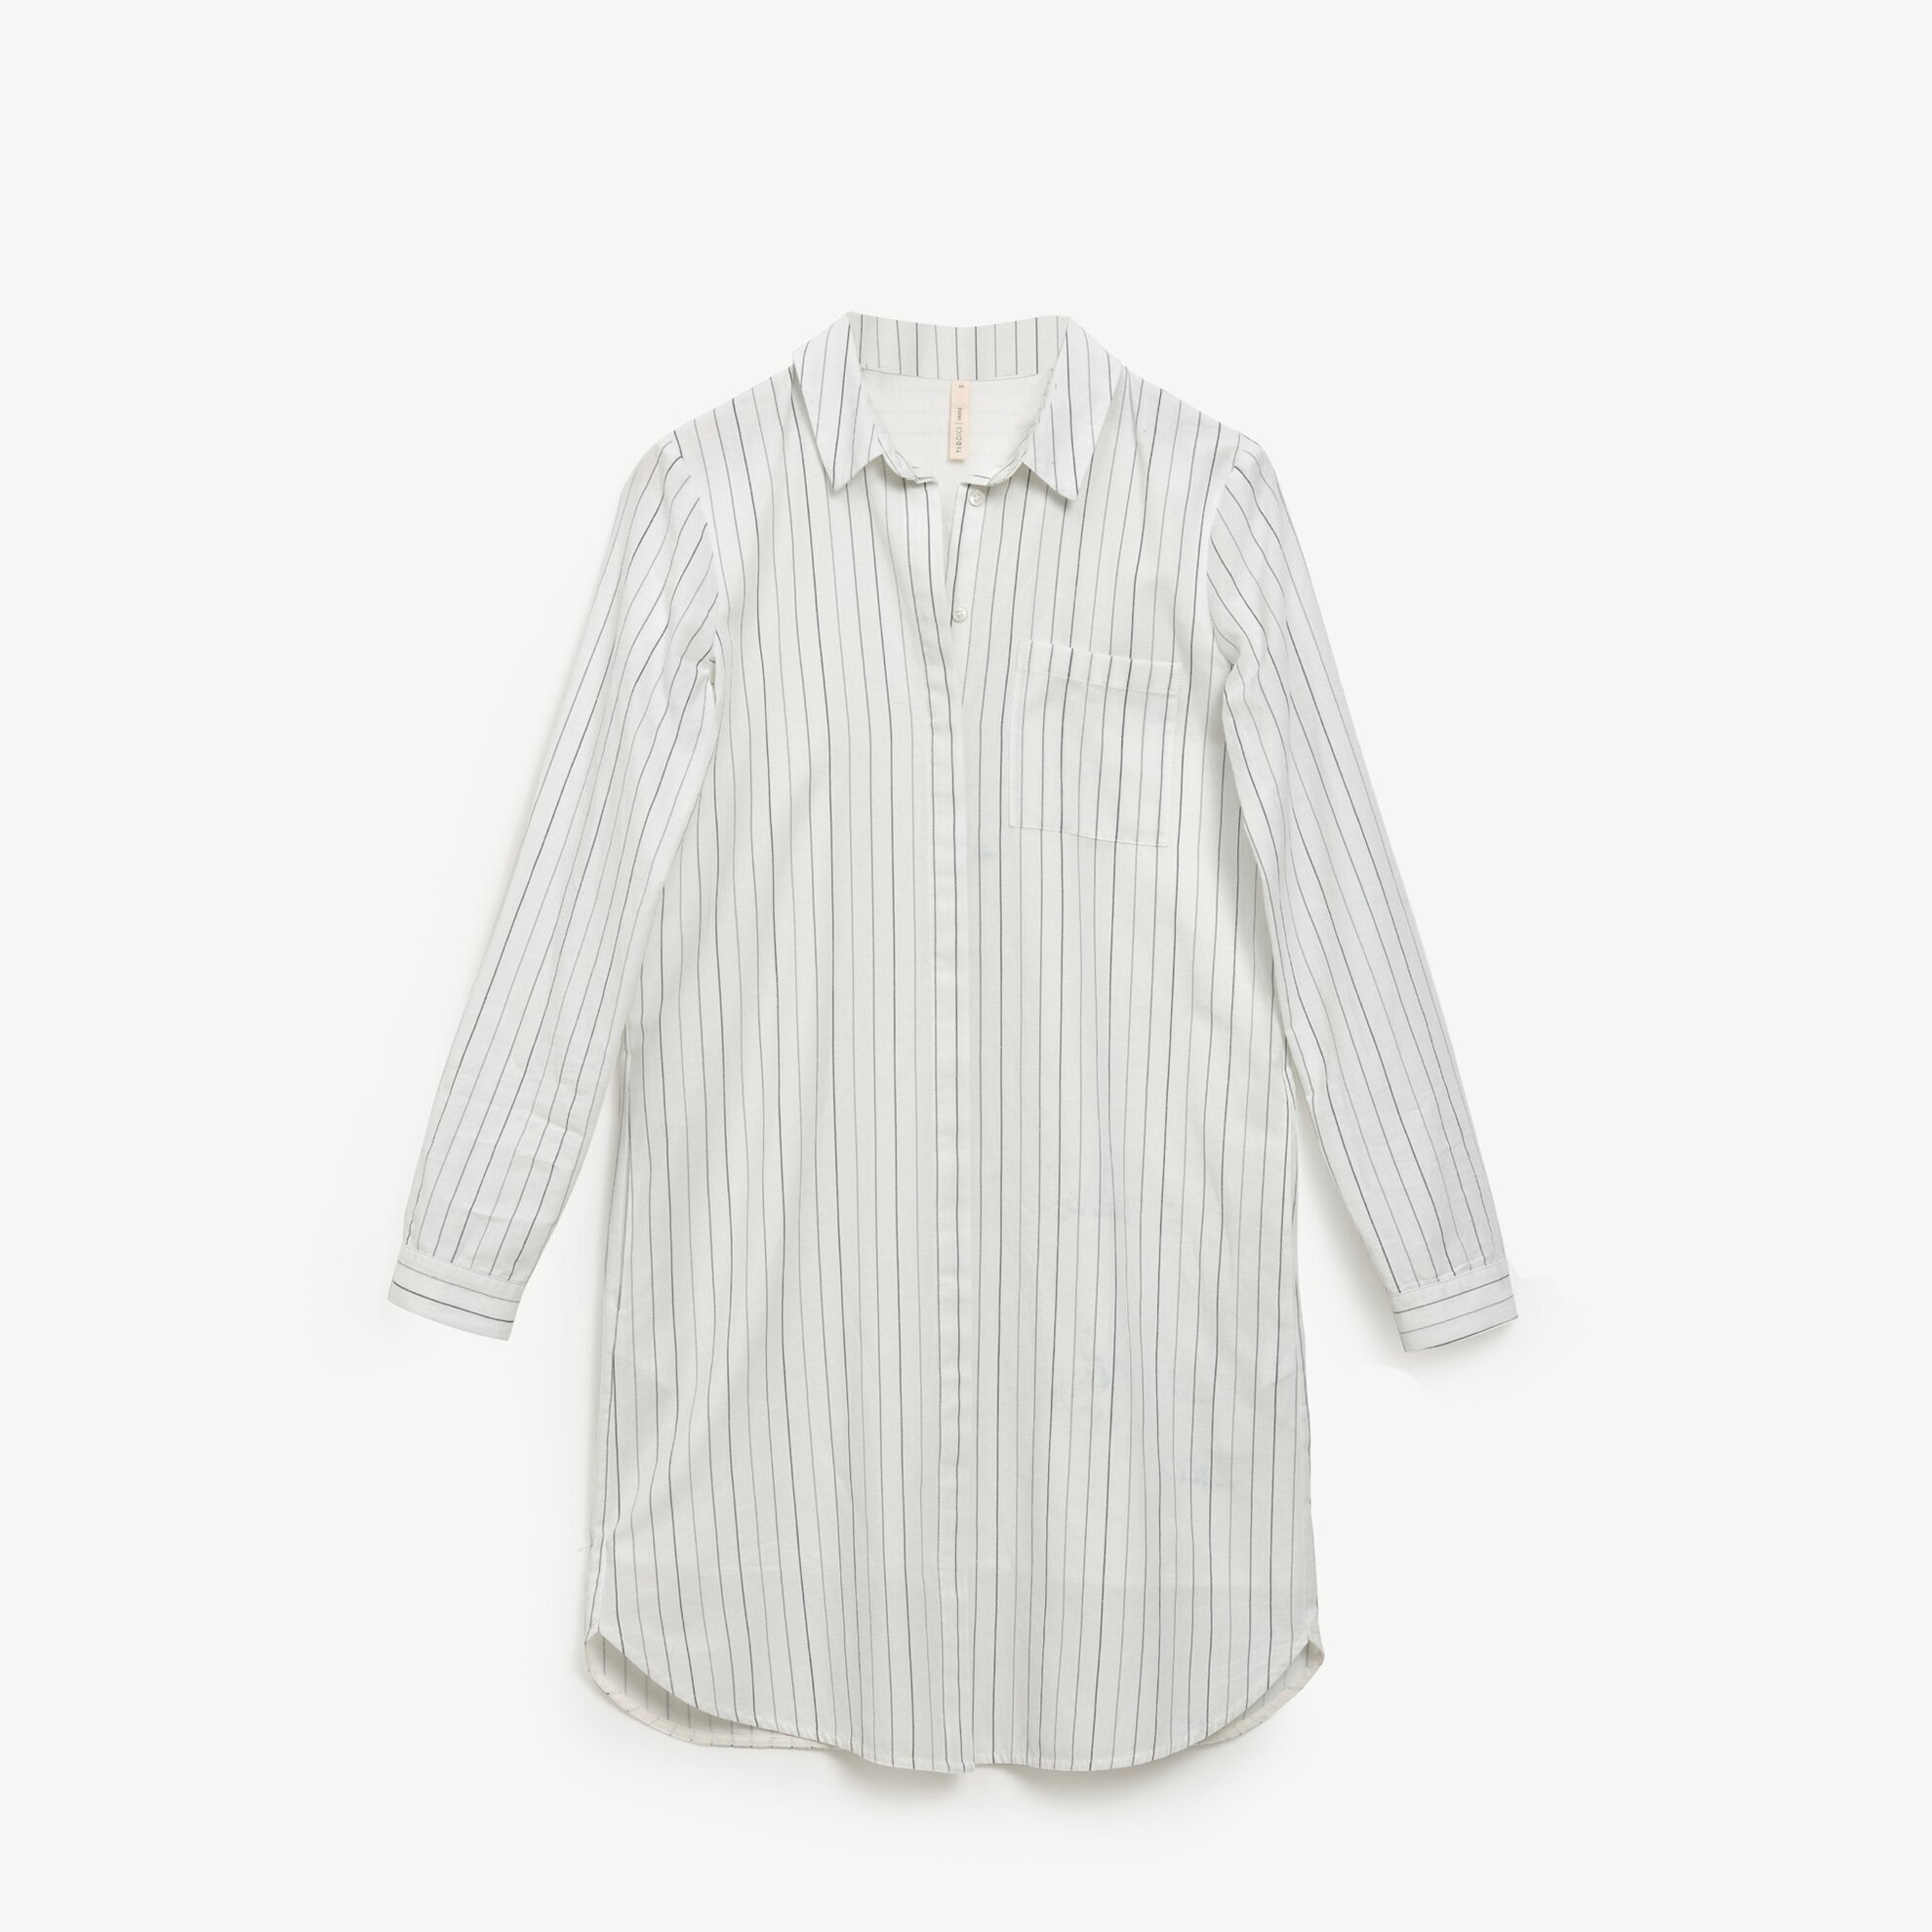 Kemer Detaylı Gömlek Elbise